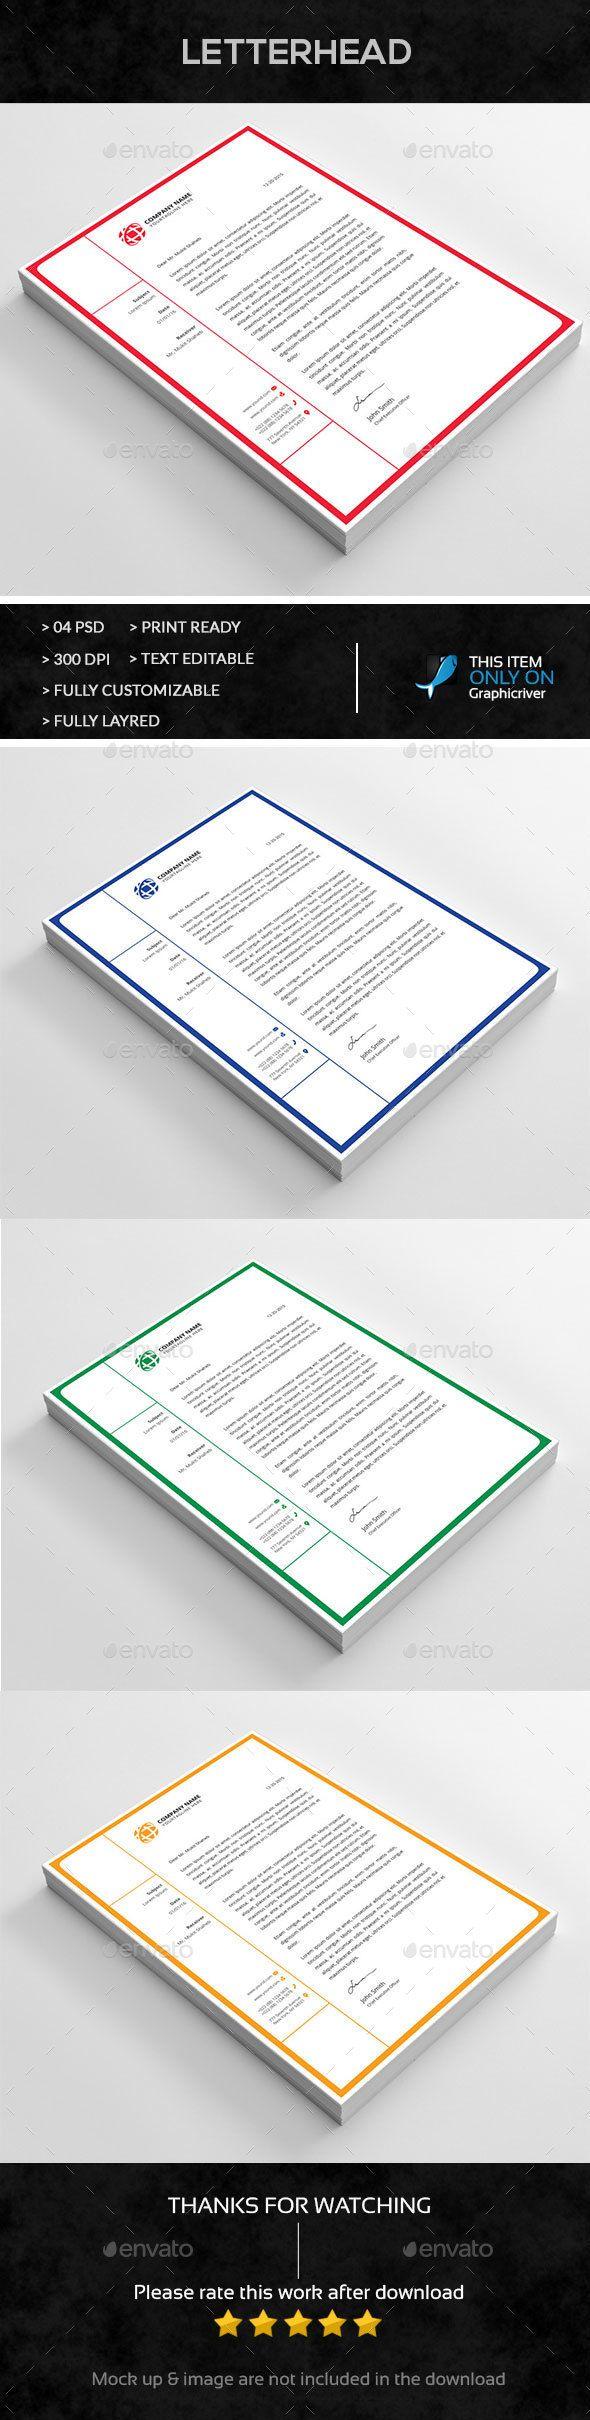 Letterhead Stationery Print Templates 209 best